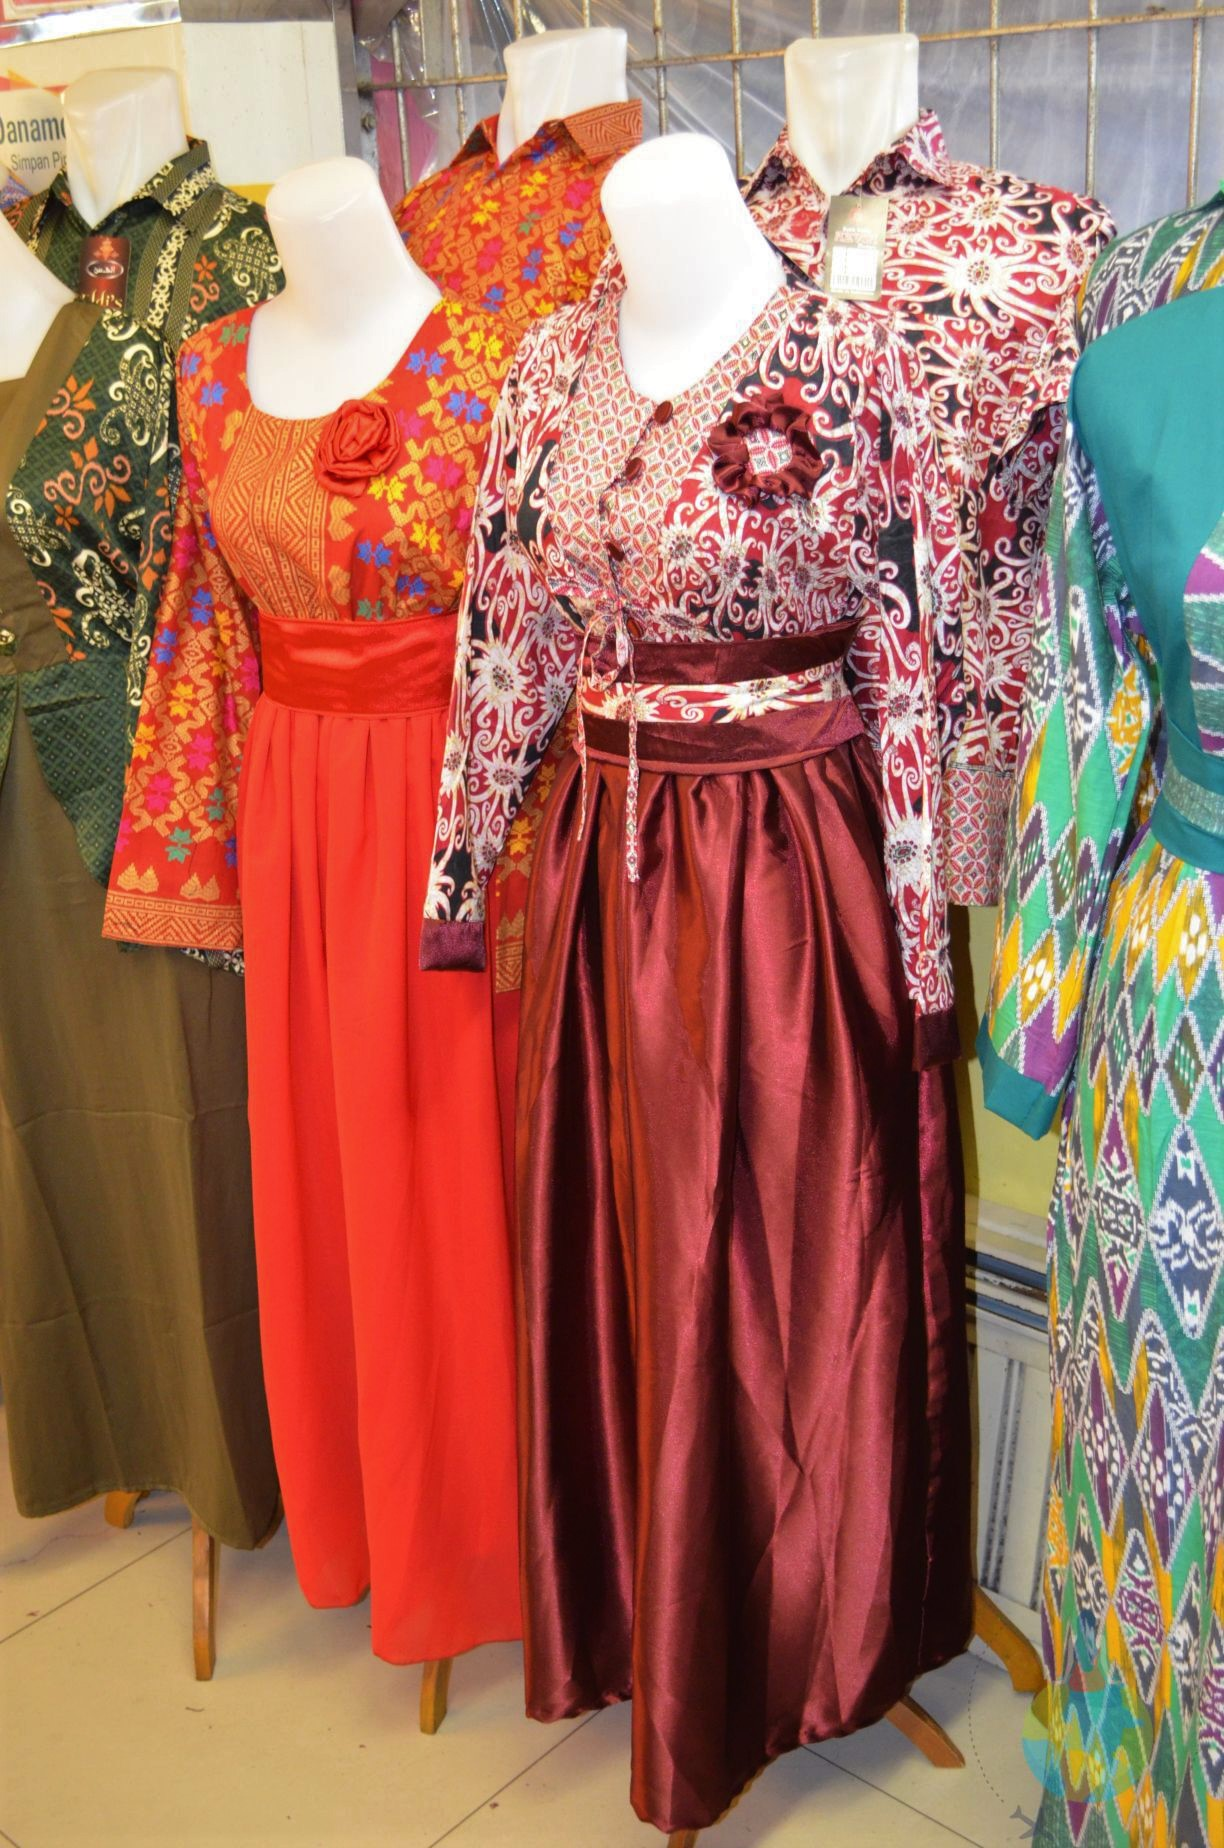 Piață, Yogyakarta, Indonezia, costume tradiționale